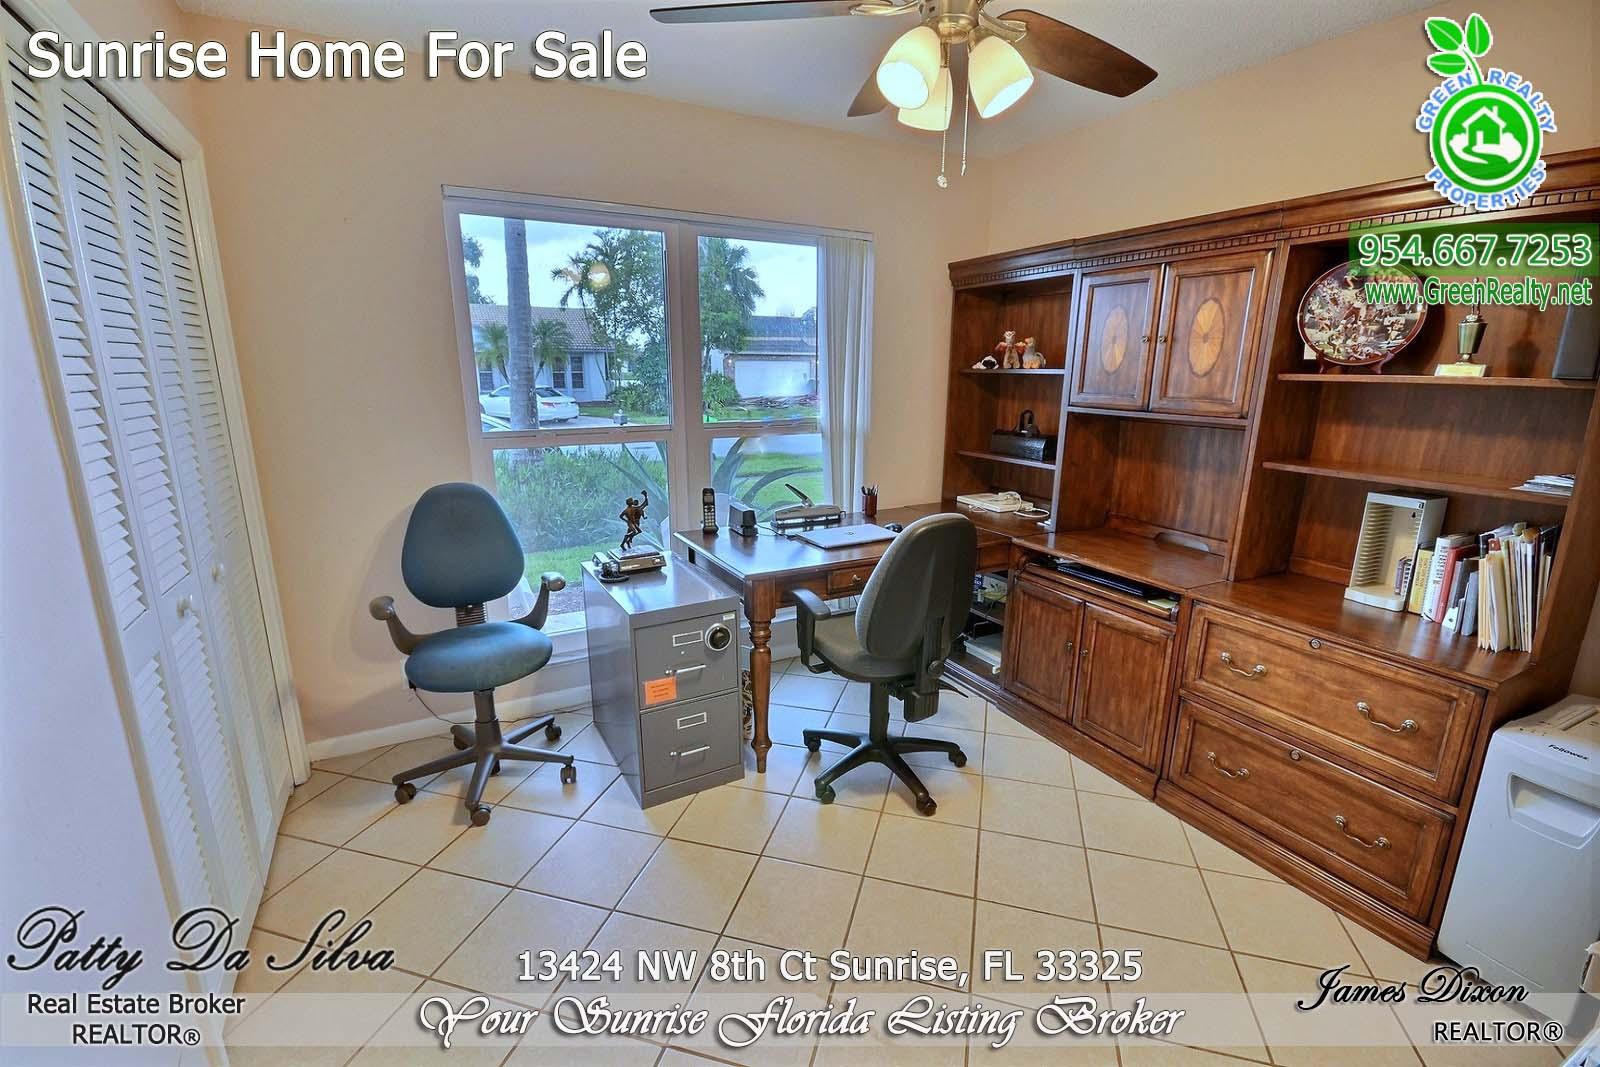 23 Sunrise Florida Pool Homes For Sale (5)